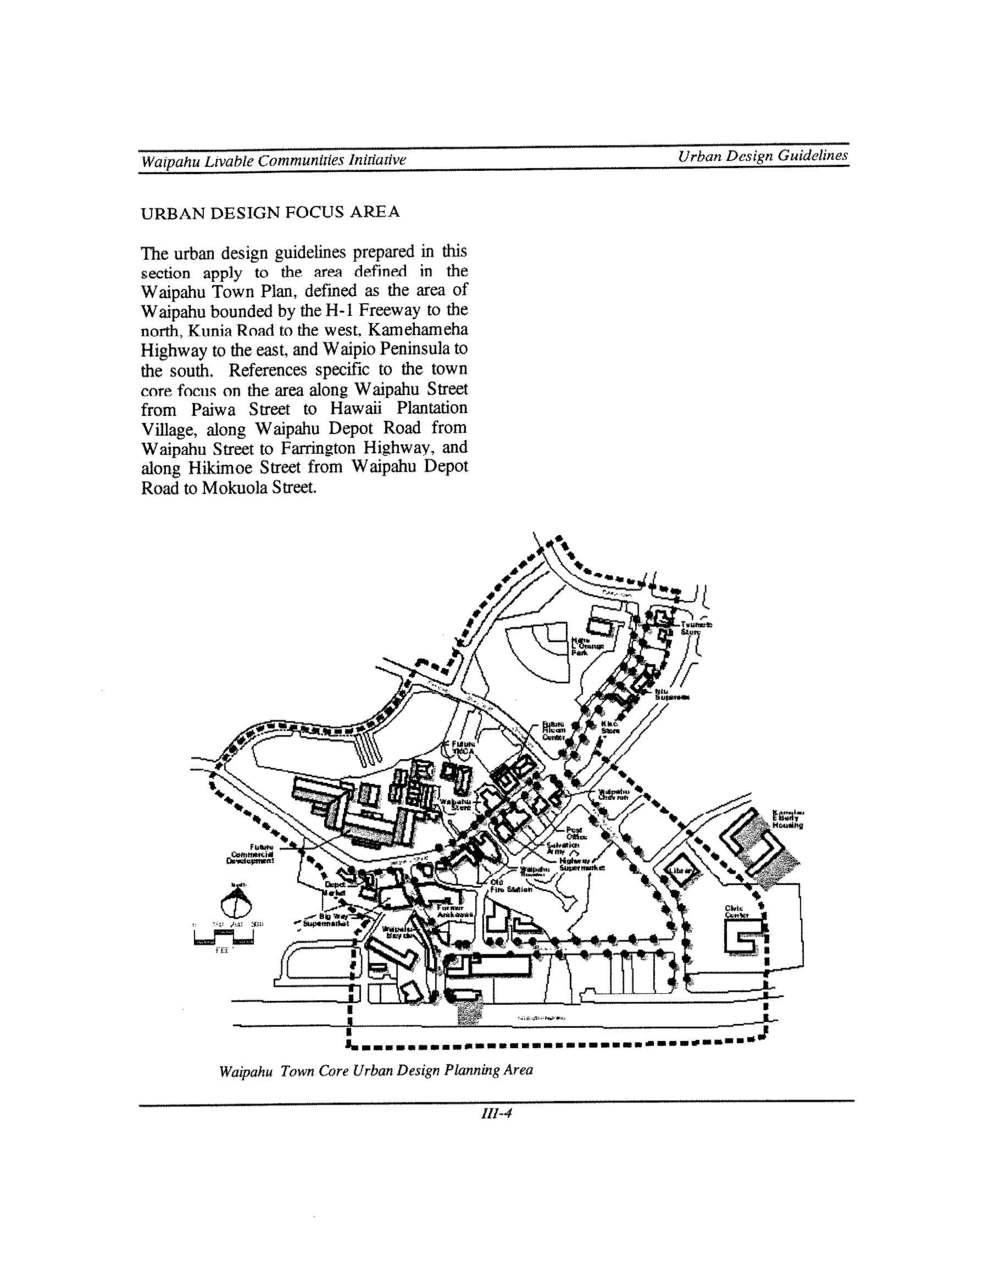 160531_WaipahuLivableCommunities(1998)_Page_094.jpg